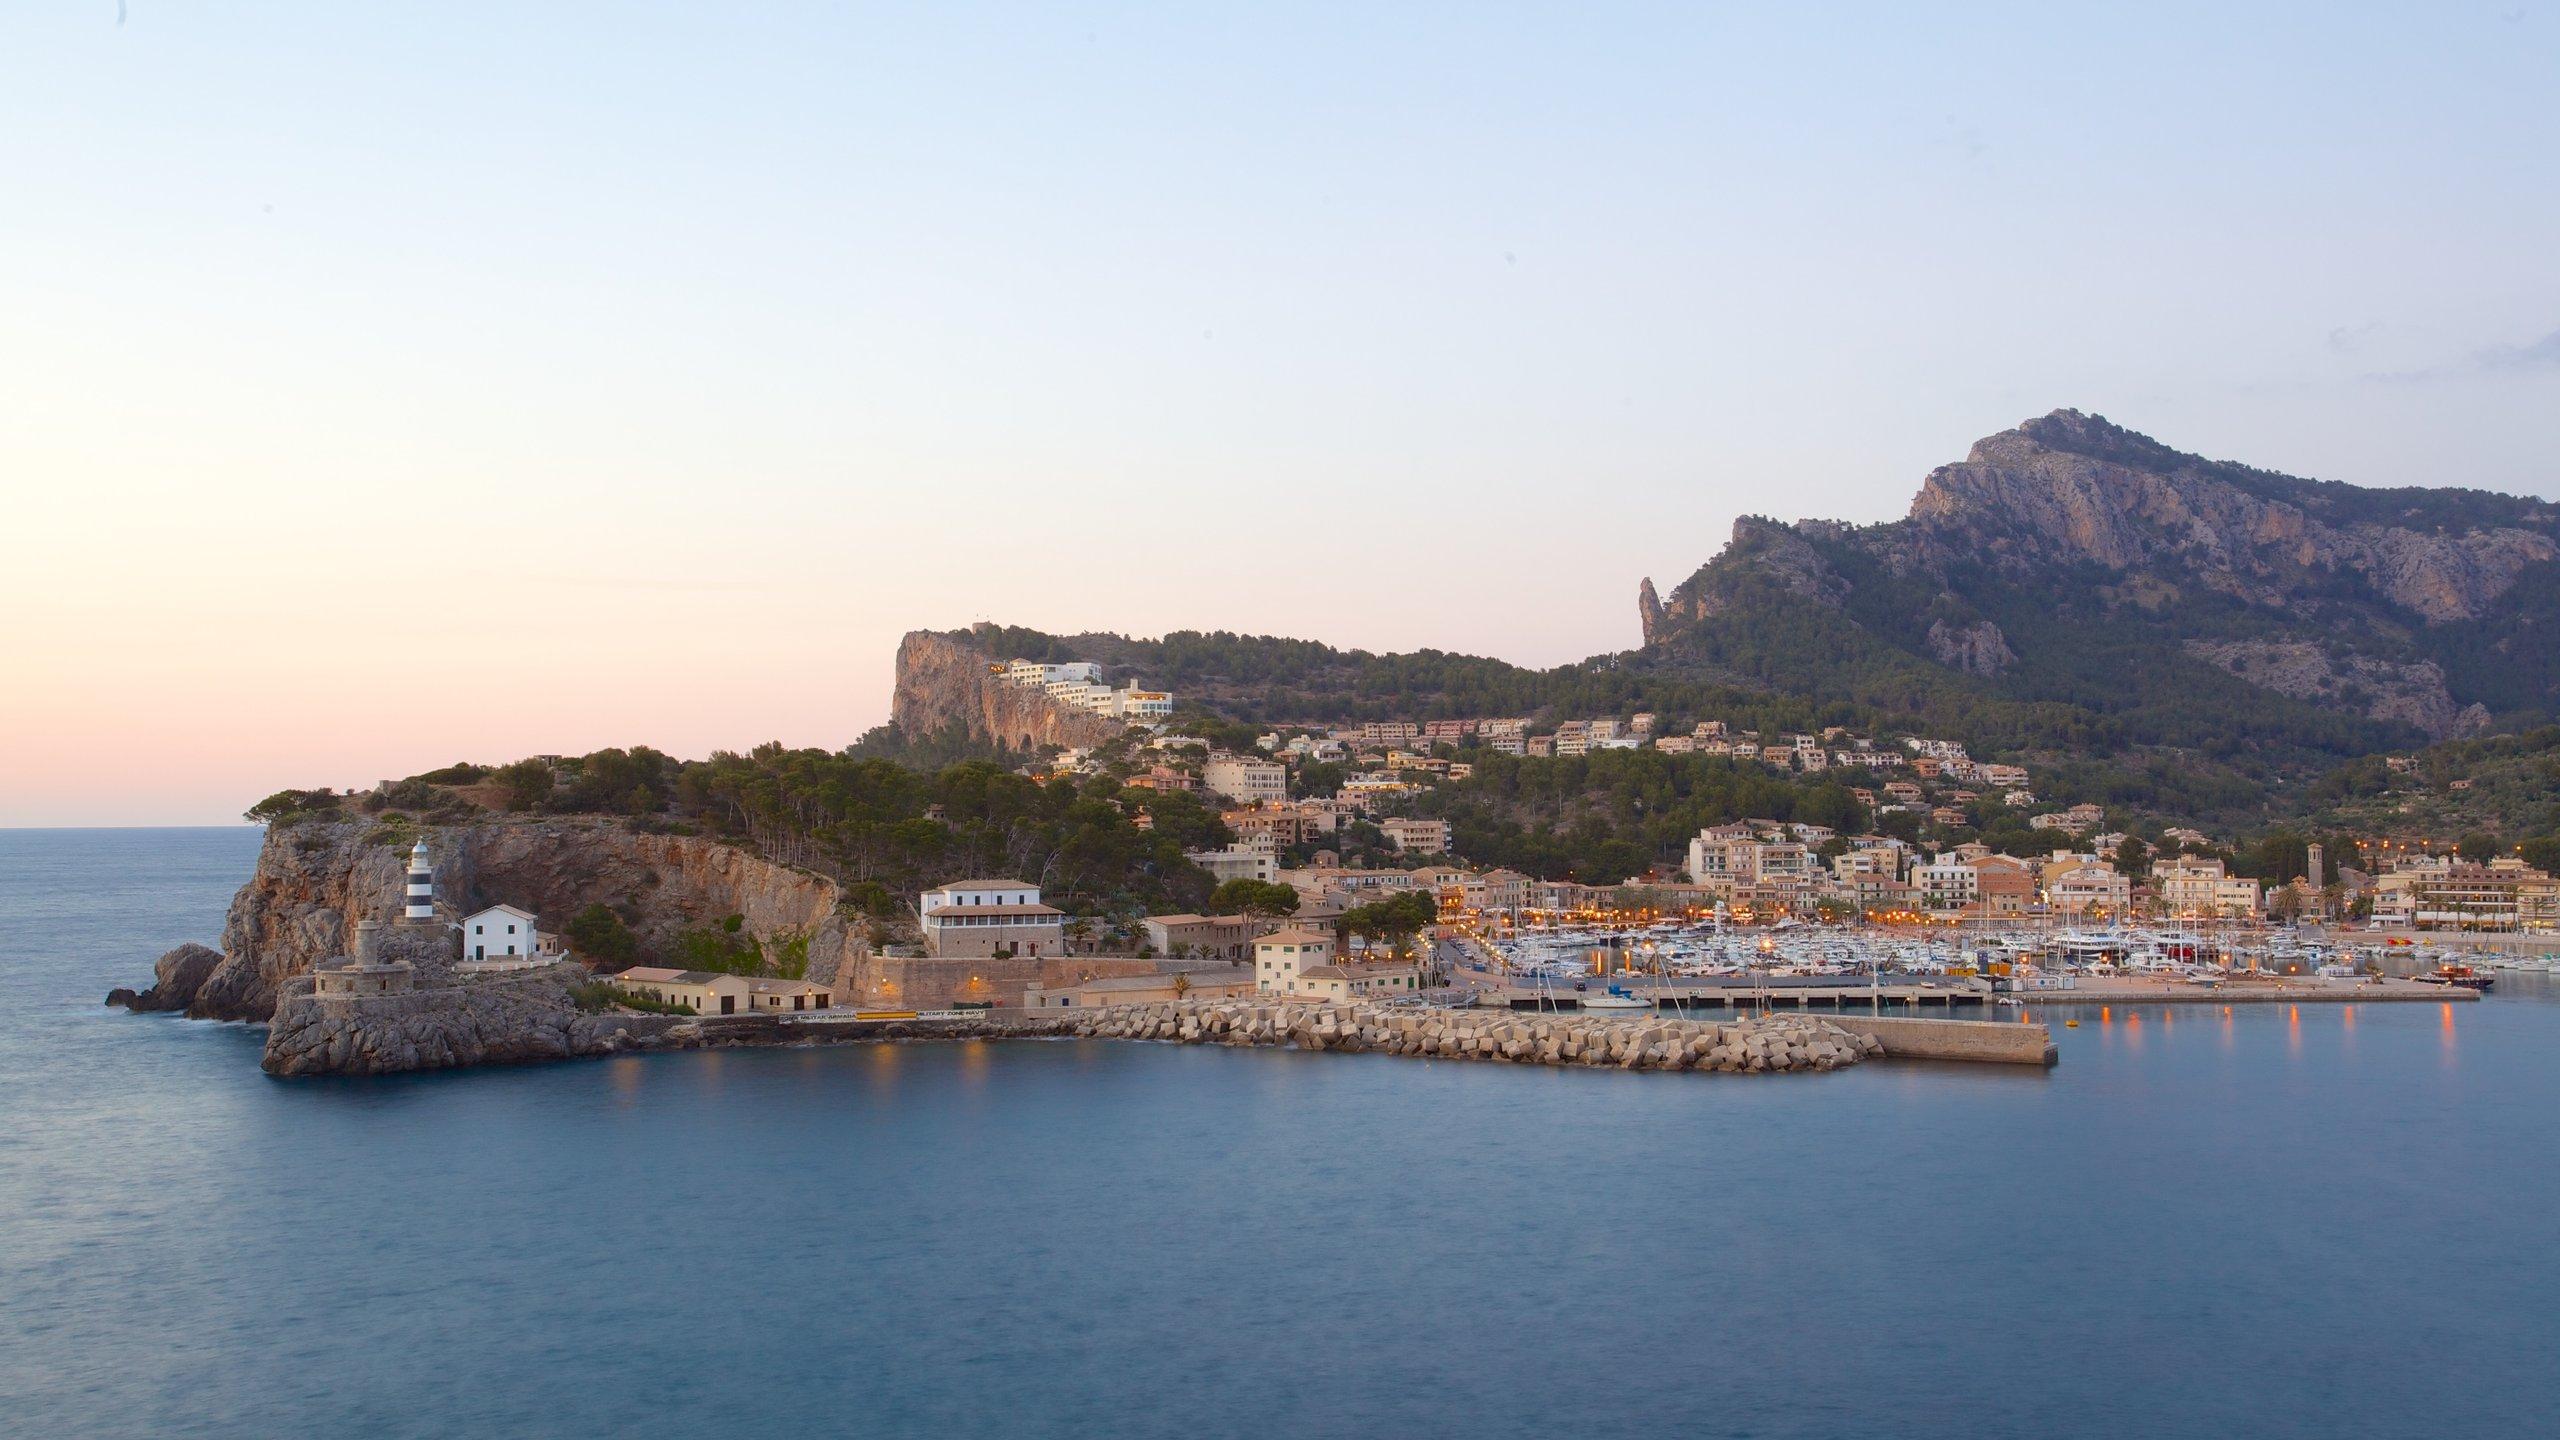 Soller, Balearic Islands, Spain